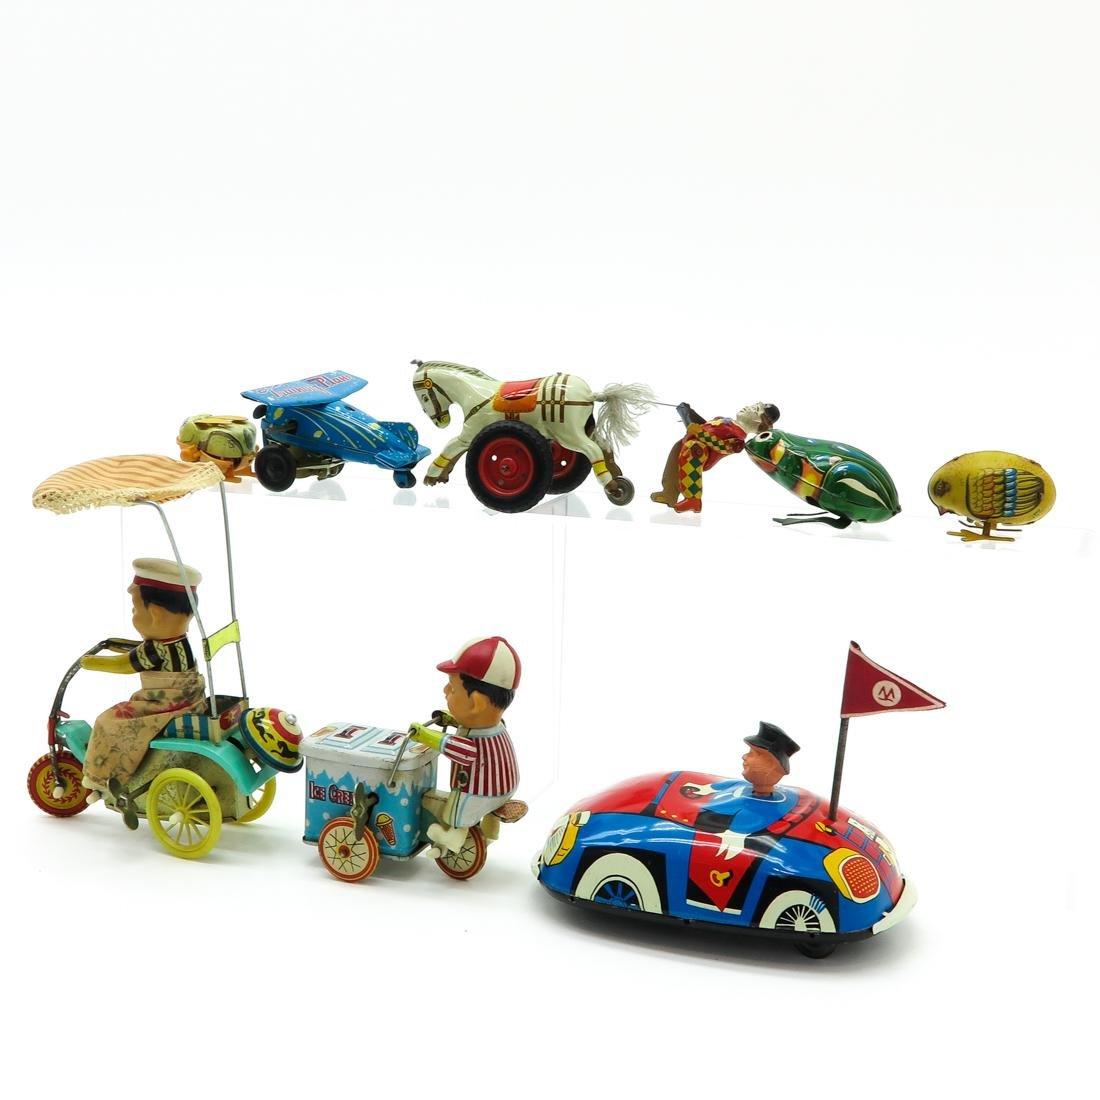 Diverse Lot of 8 Vintage Toys - 3